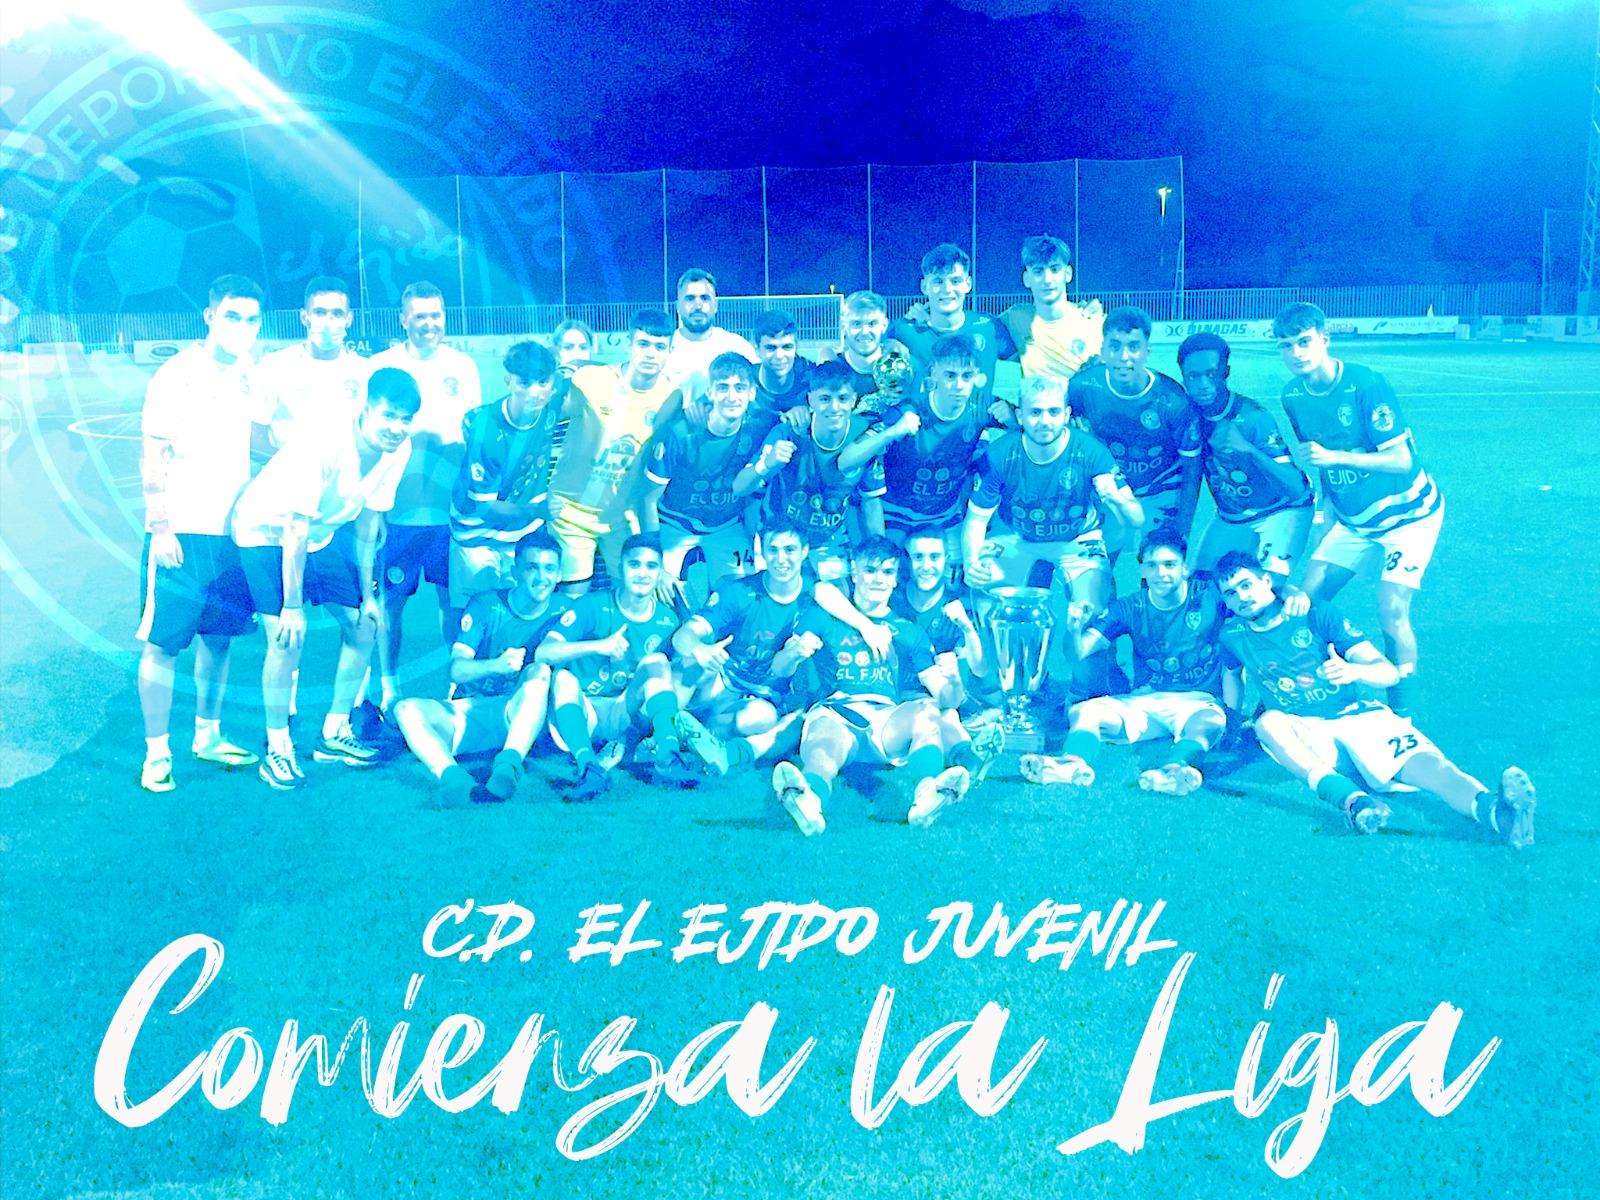 Campeonato de altura para el Juvenil del CD El Ejido